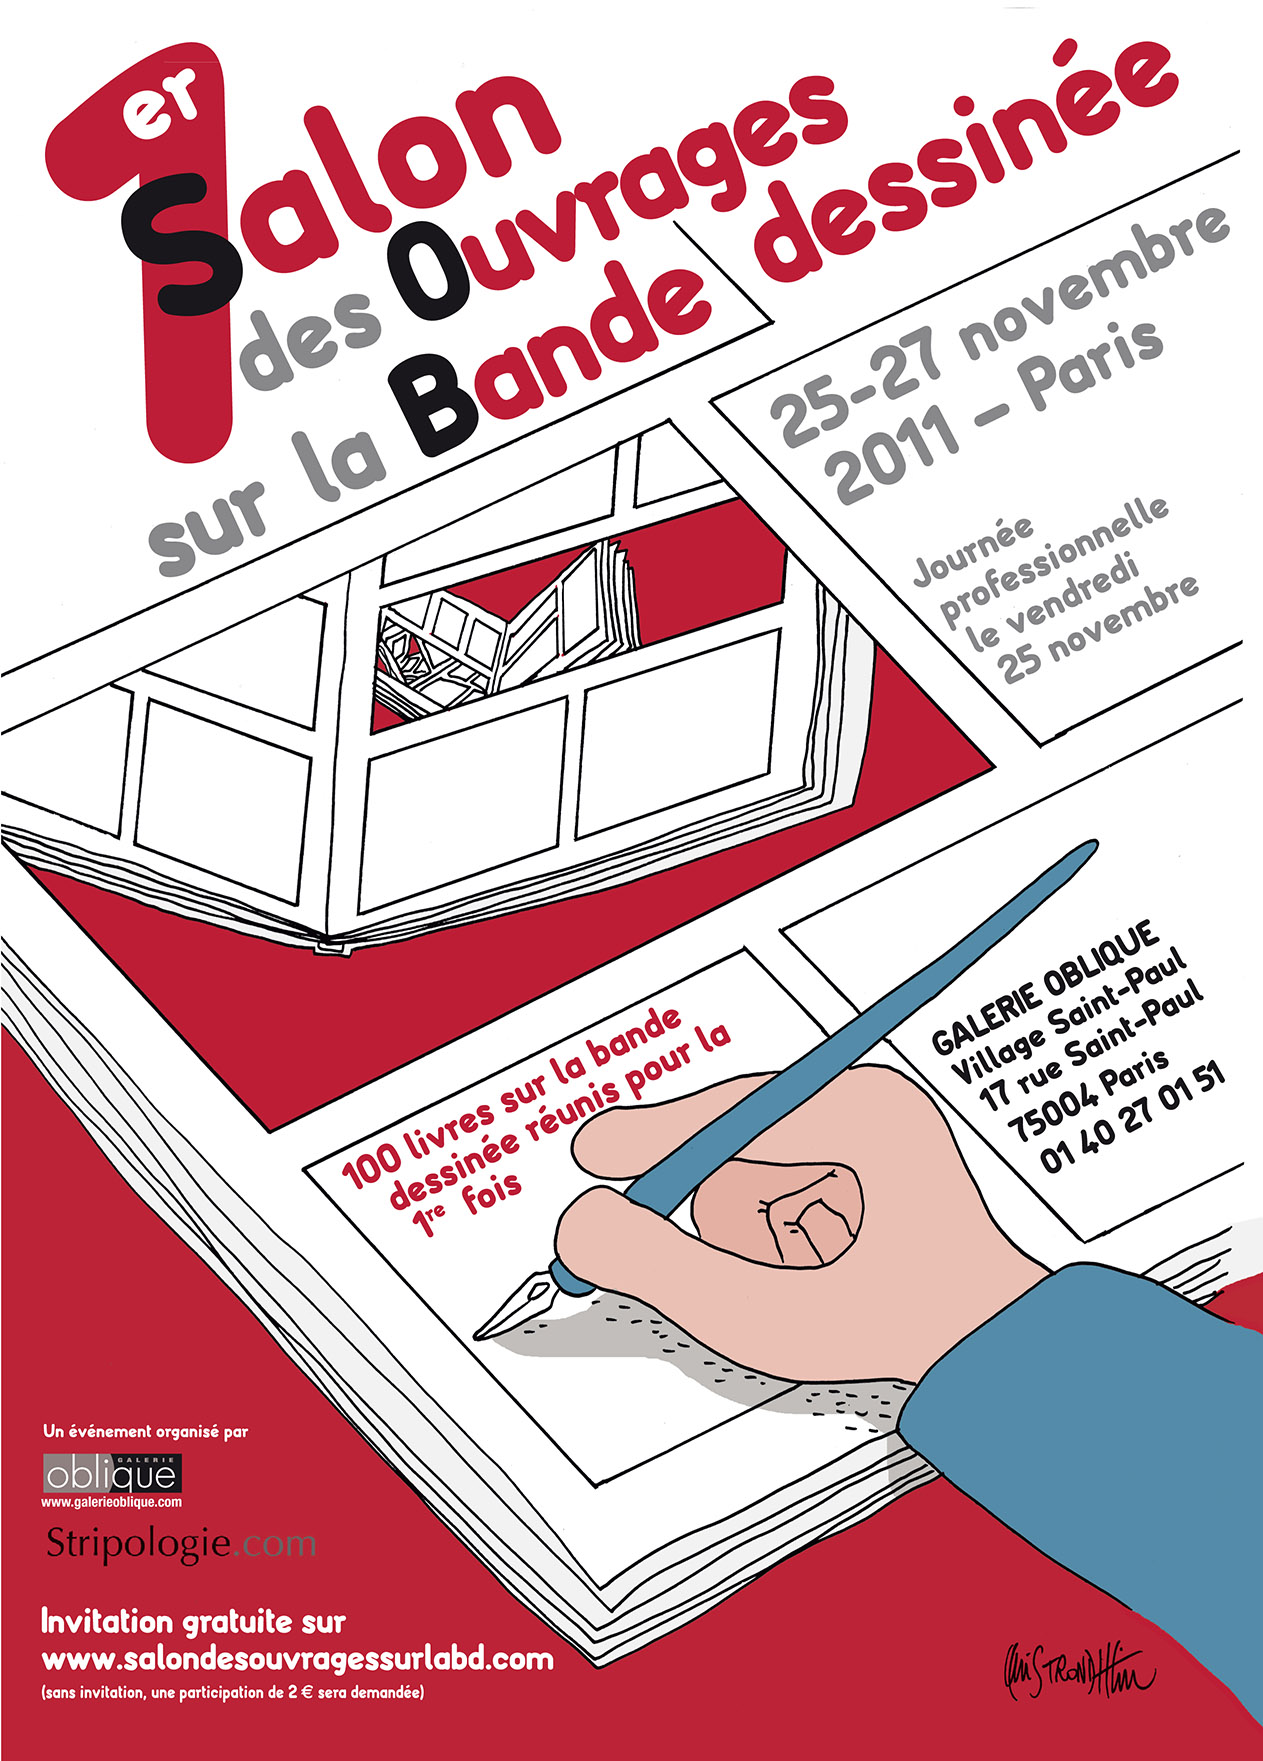 SoBD 2011 - L'Affiche